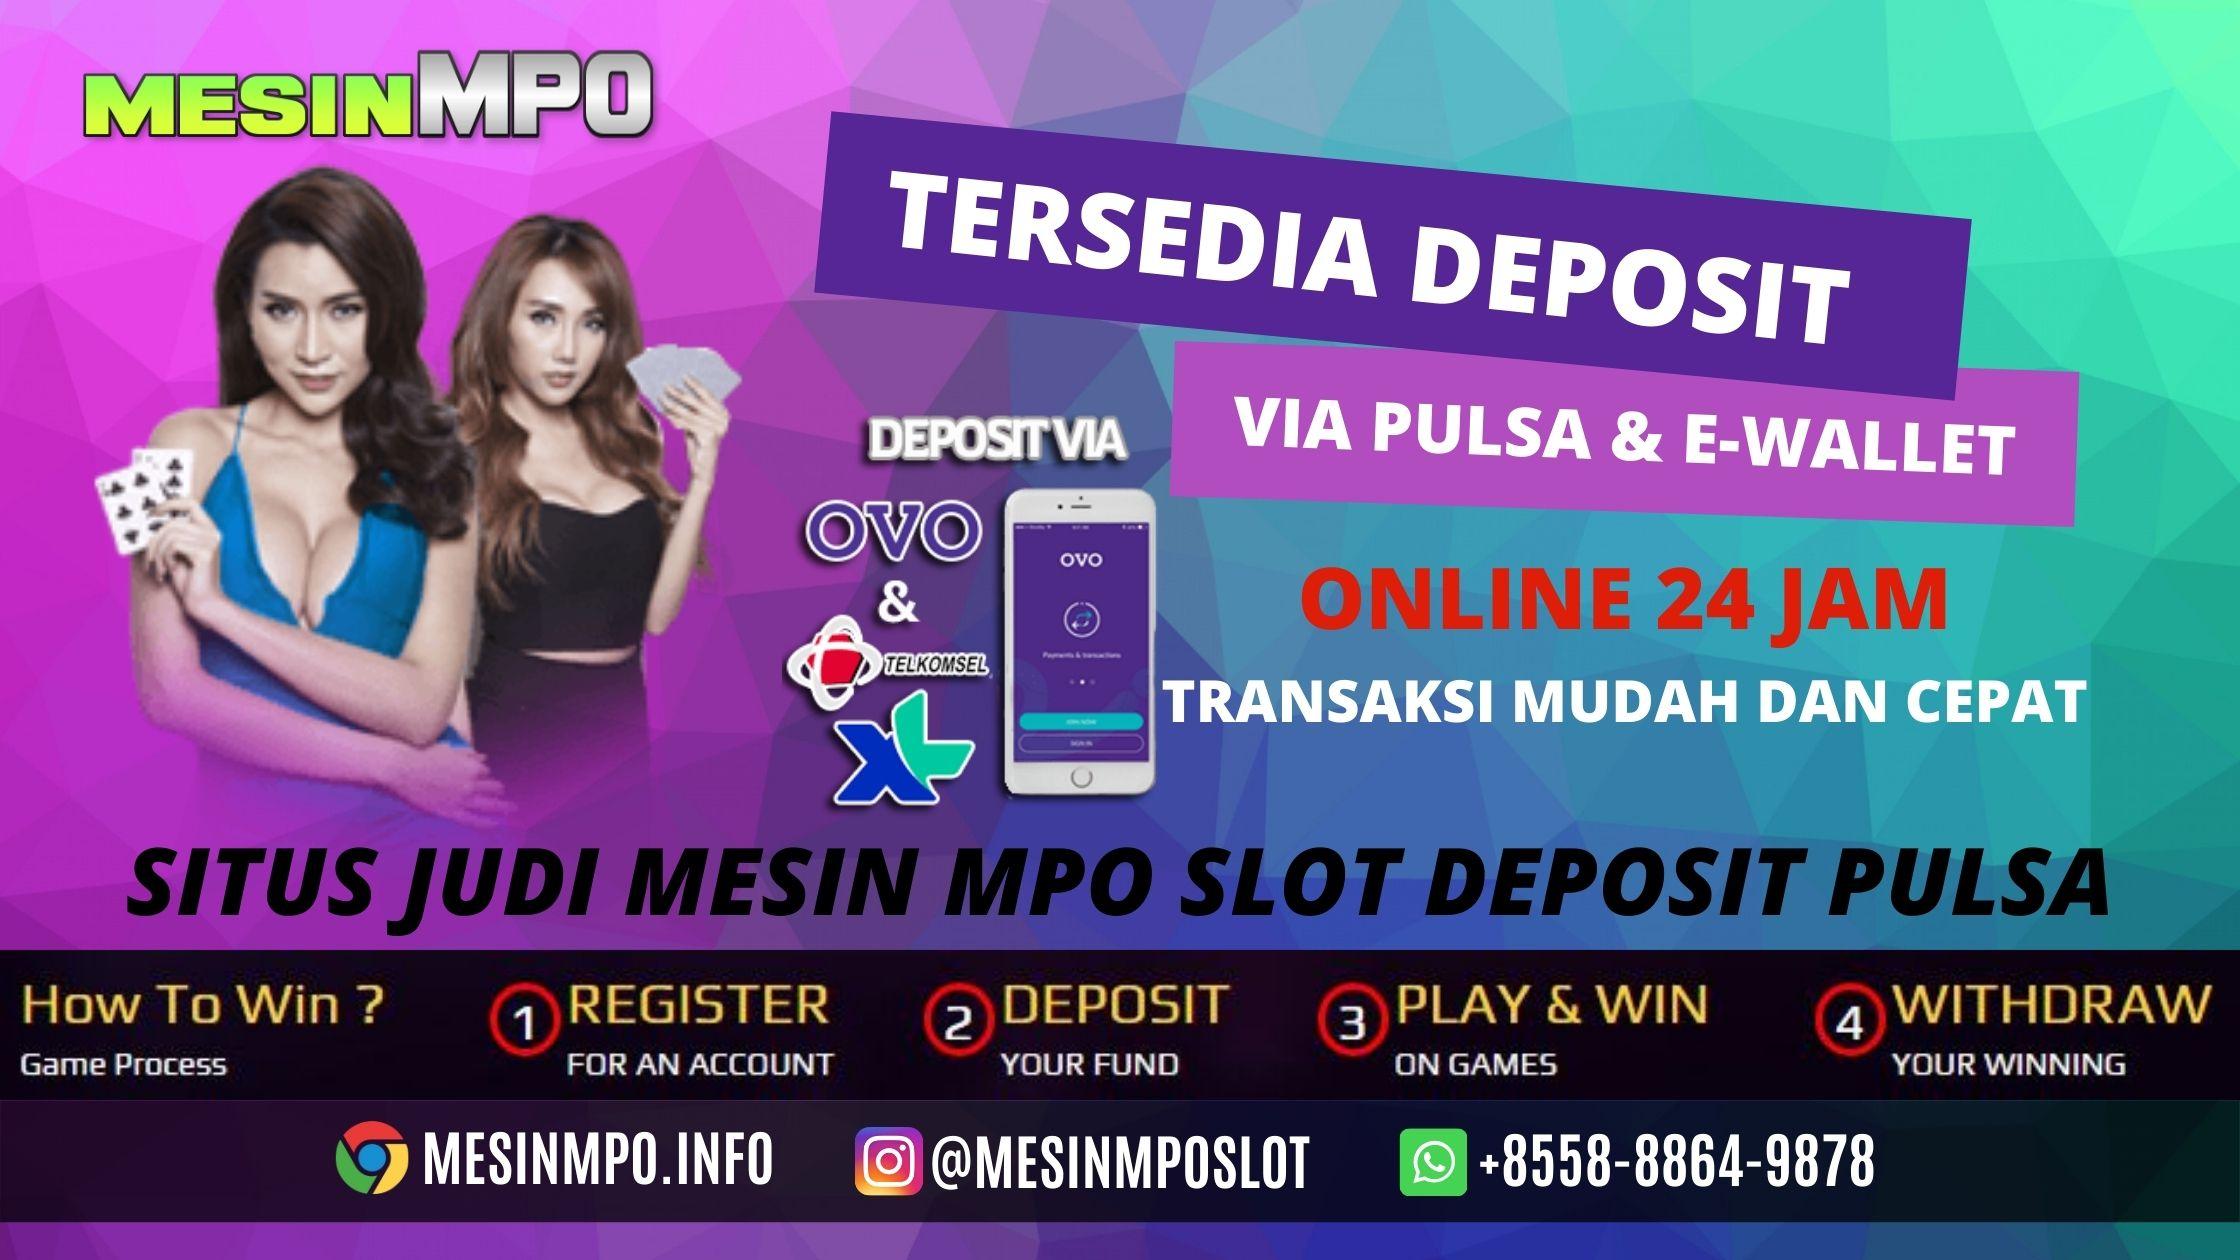 Situs Mpo Slot Terbaru Deposit Pulsa Online 24 Jam Daftar Judi Mesin Mpo Slot Pulsa Terbaru Dan Terpercaya